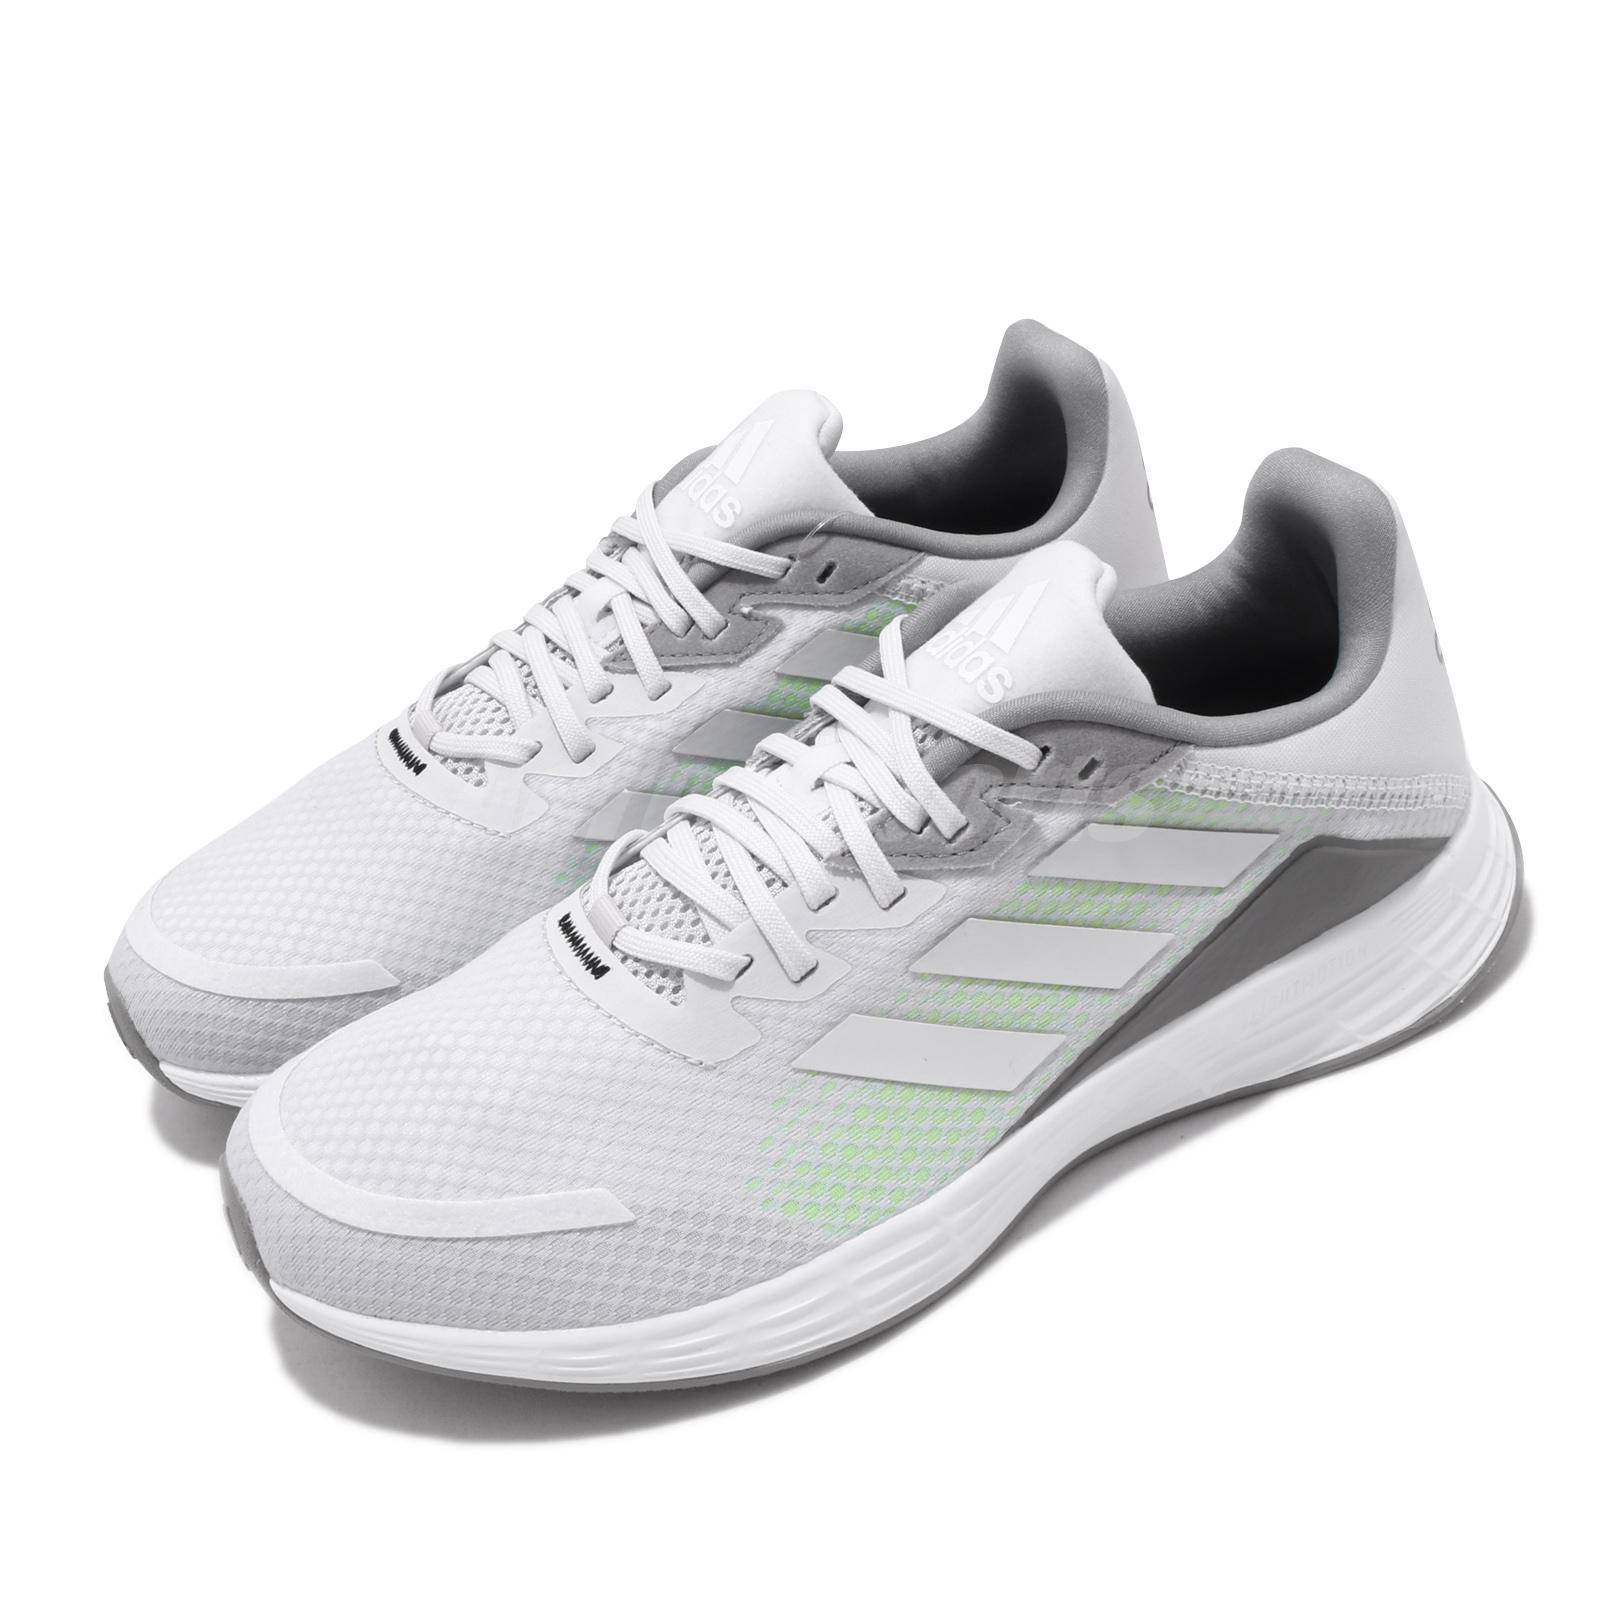 adidas Duramo SL Grey White Green Men